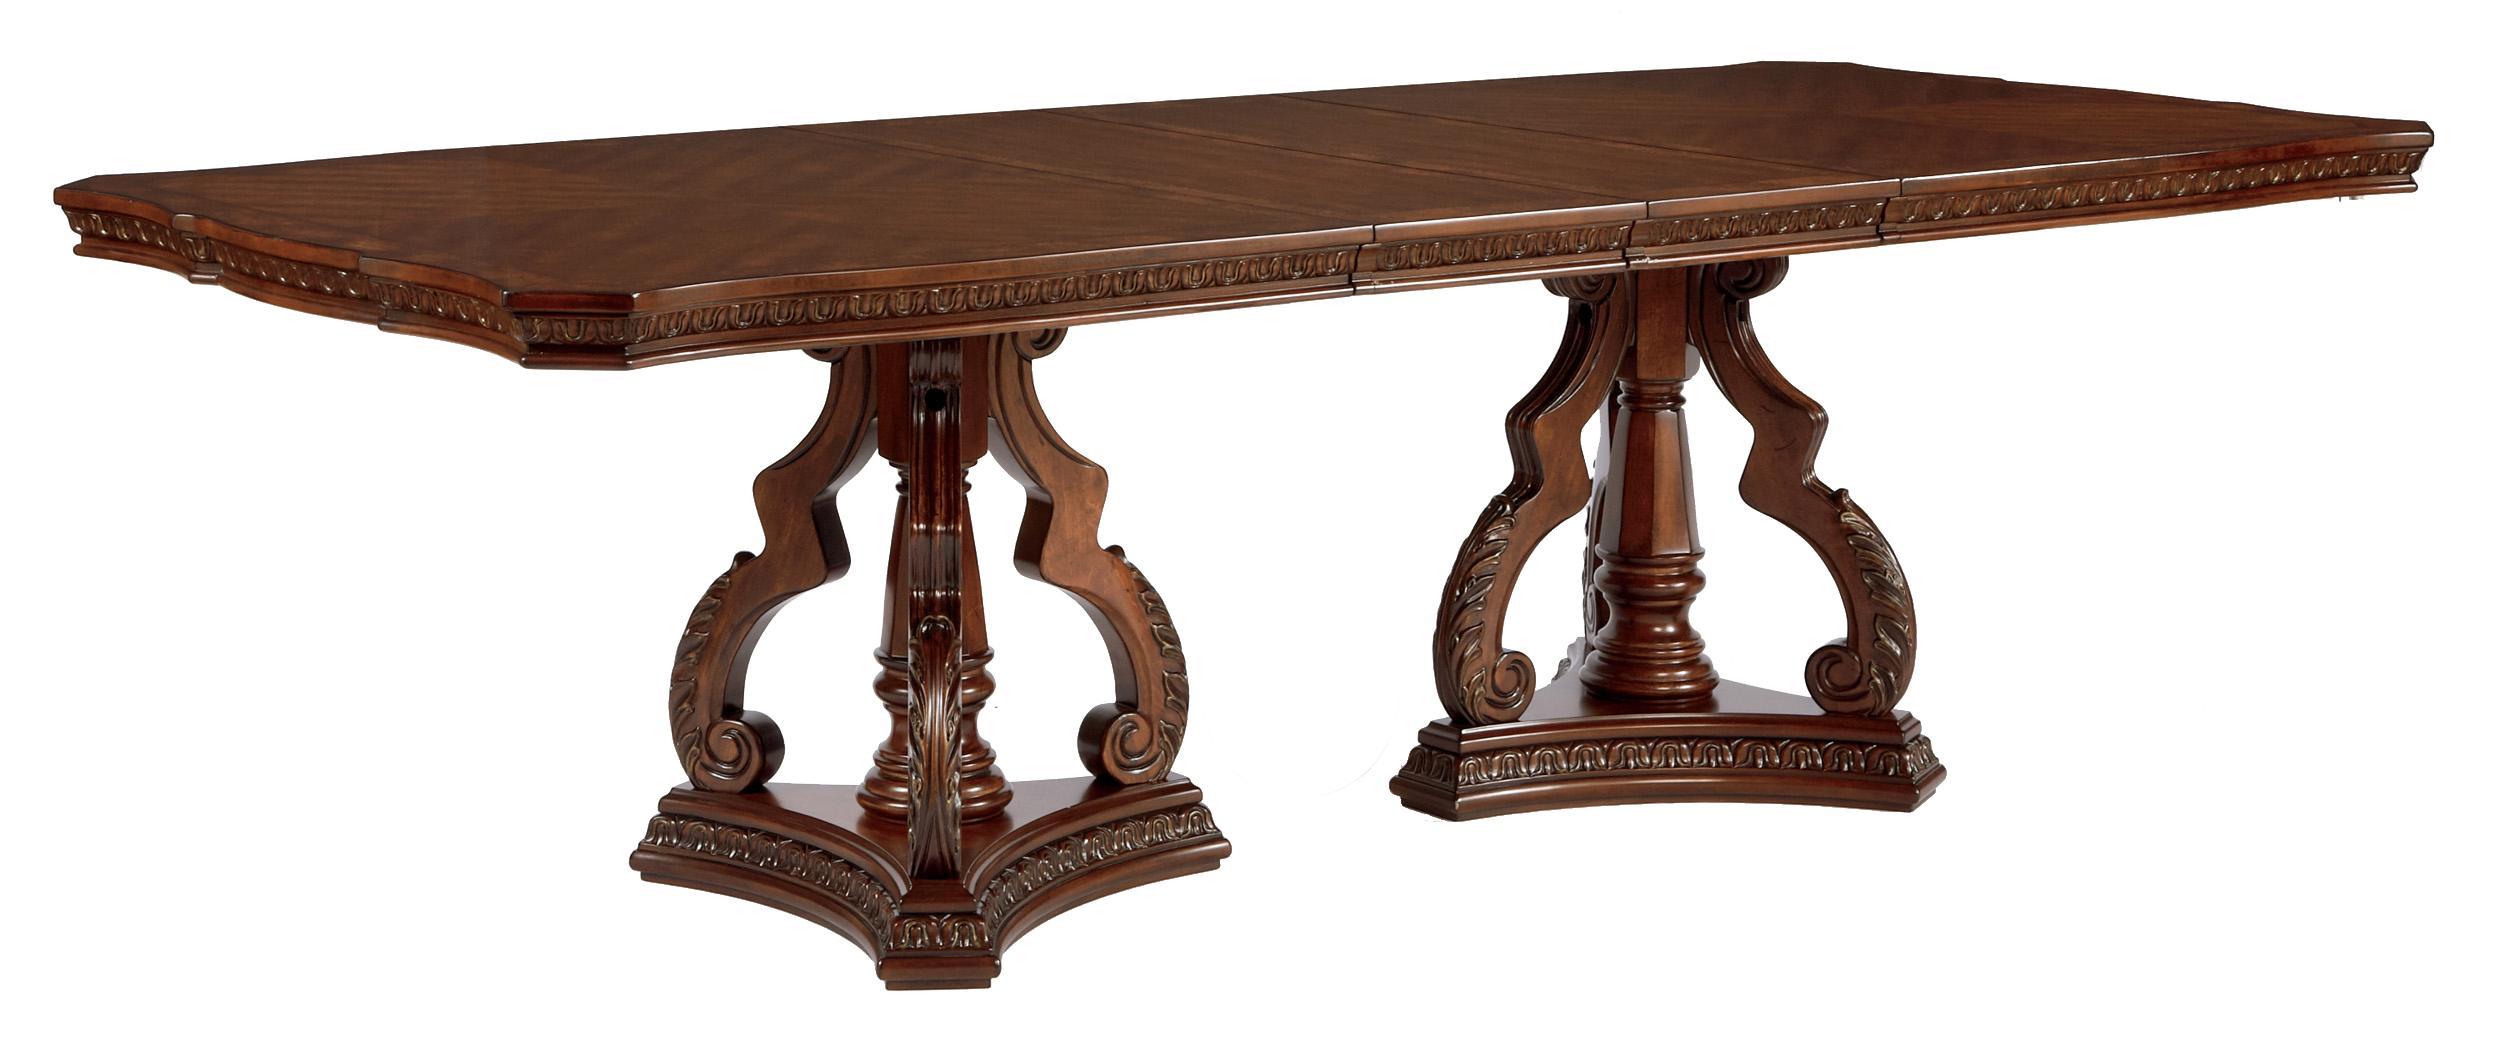 Millennium Ledelle Dining Table - Item Number: D705-55B+T